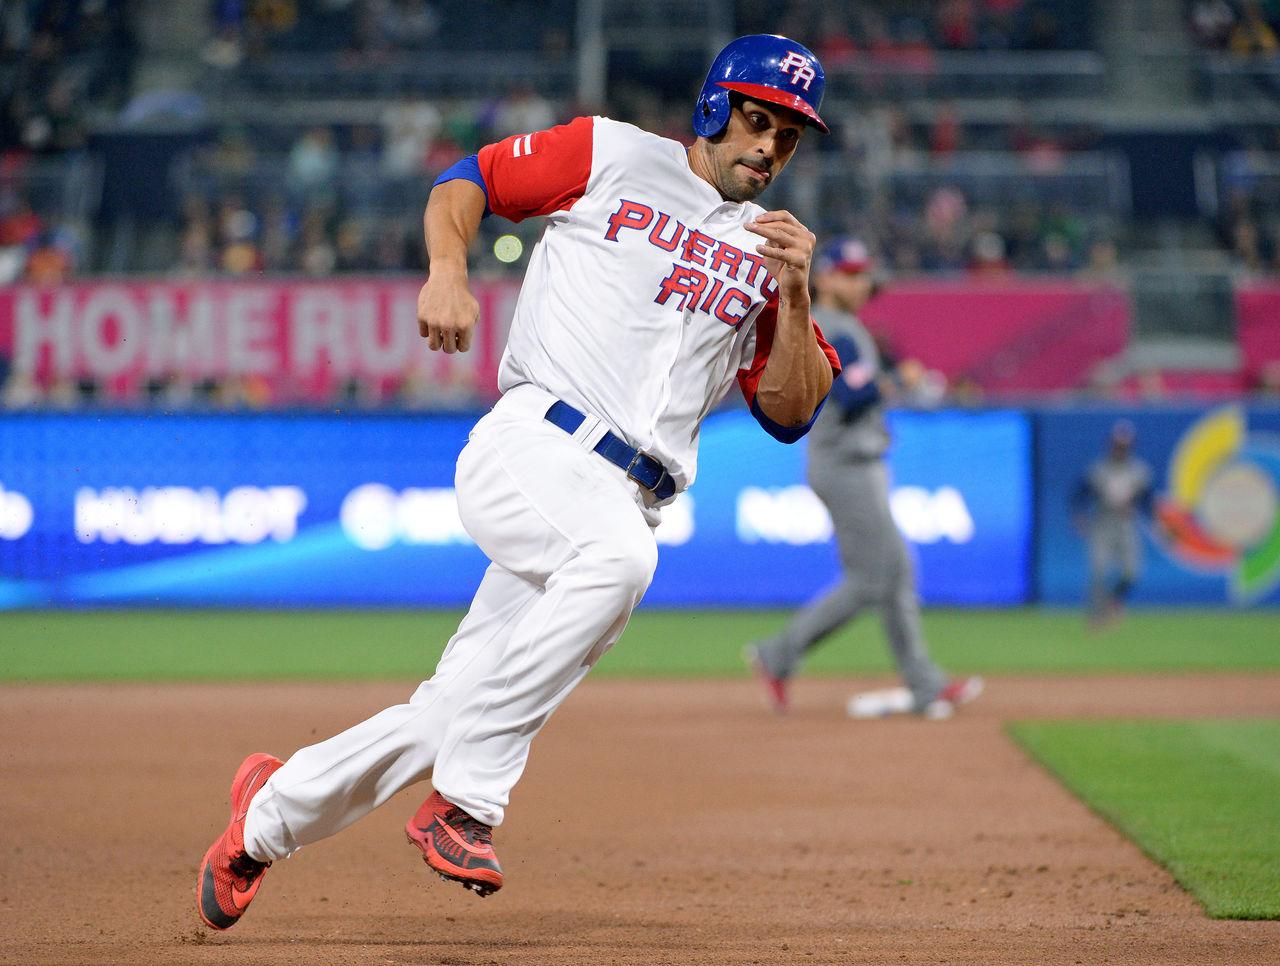 Cropped_2017-03-18t062532z_1418422298_nocid_rtrmadp_3_baseball-world-baseball-classic-usa-at-puerto-rico